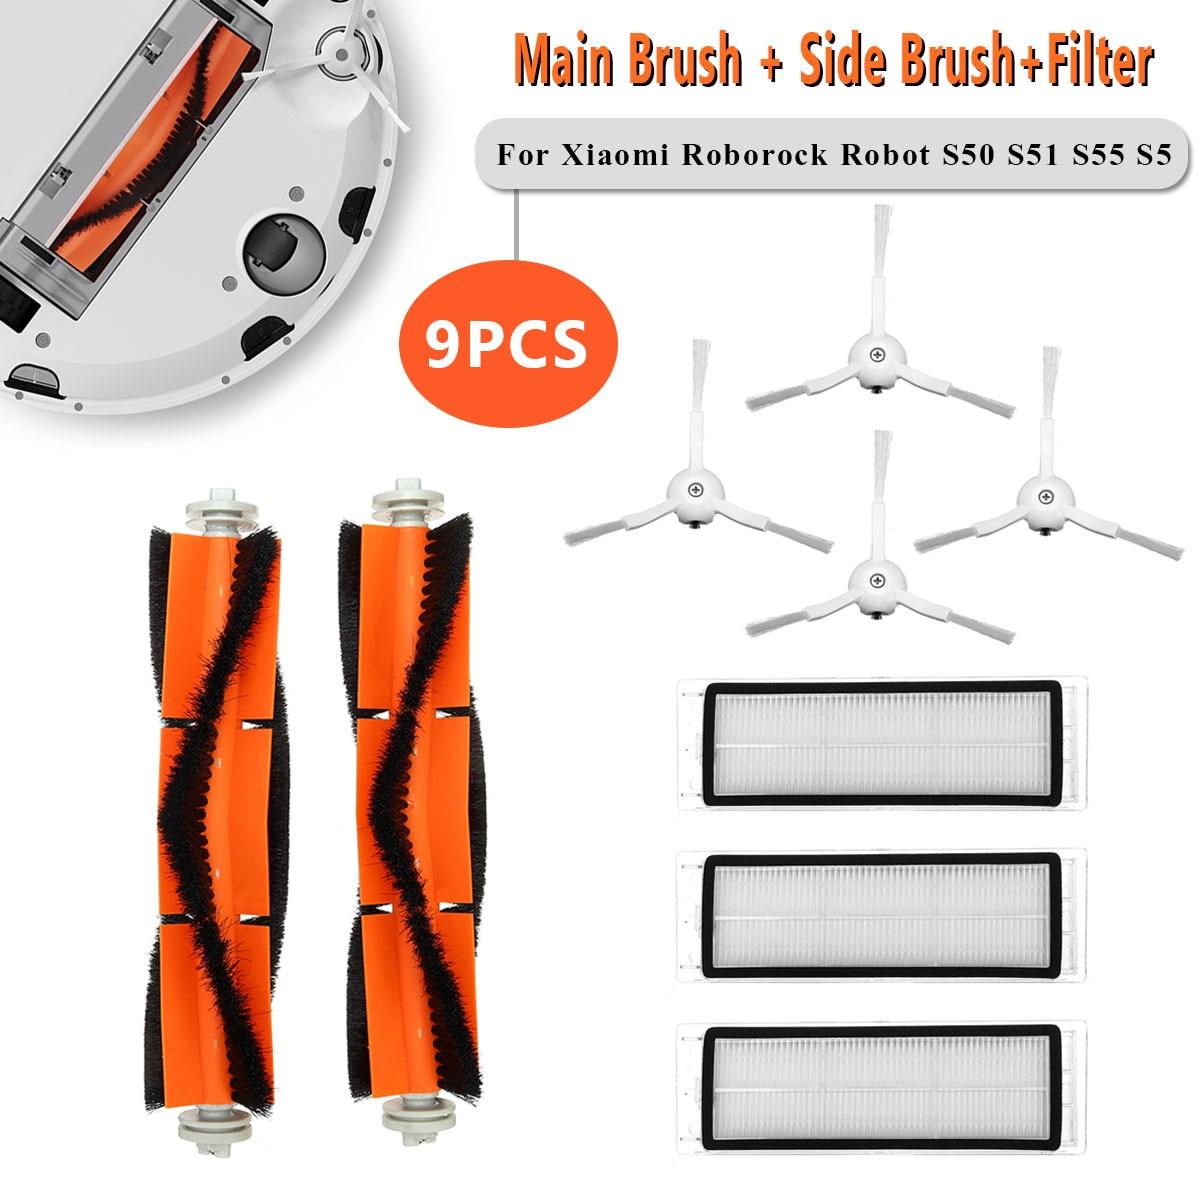 9pcs Main Brush HEPA Filter Side Brush for Xiaomi Roborock MI S50 S51 S55 S5 Vacuum Cleaner Spare Parts Accessories Vacuum Cleaner Parts     - title=